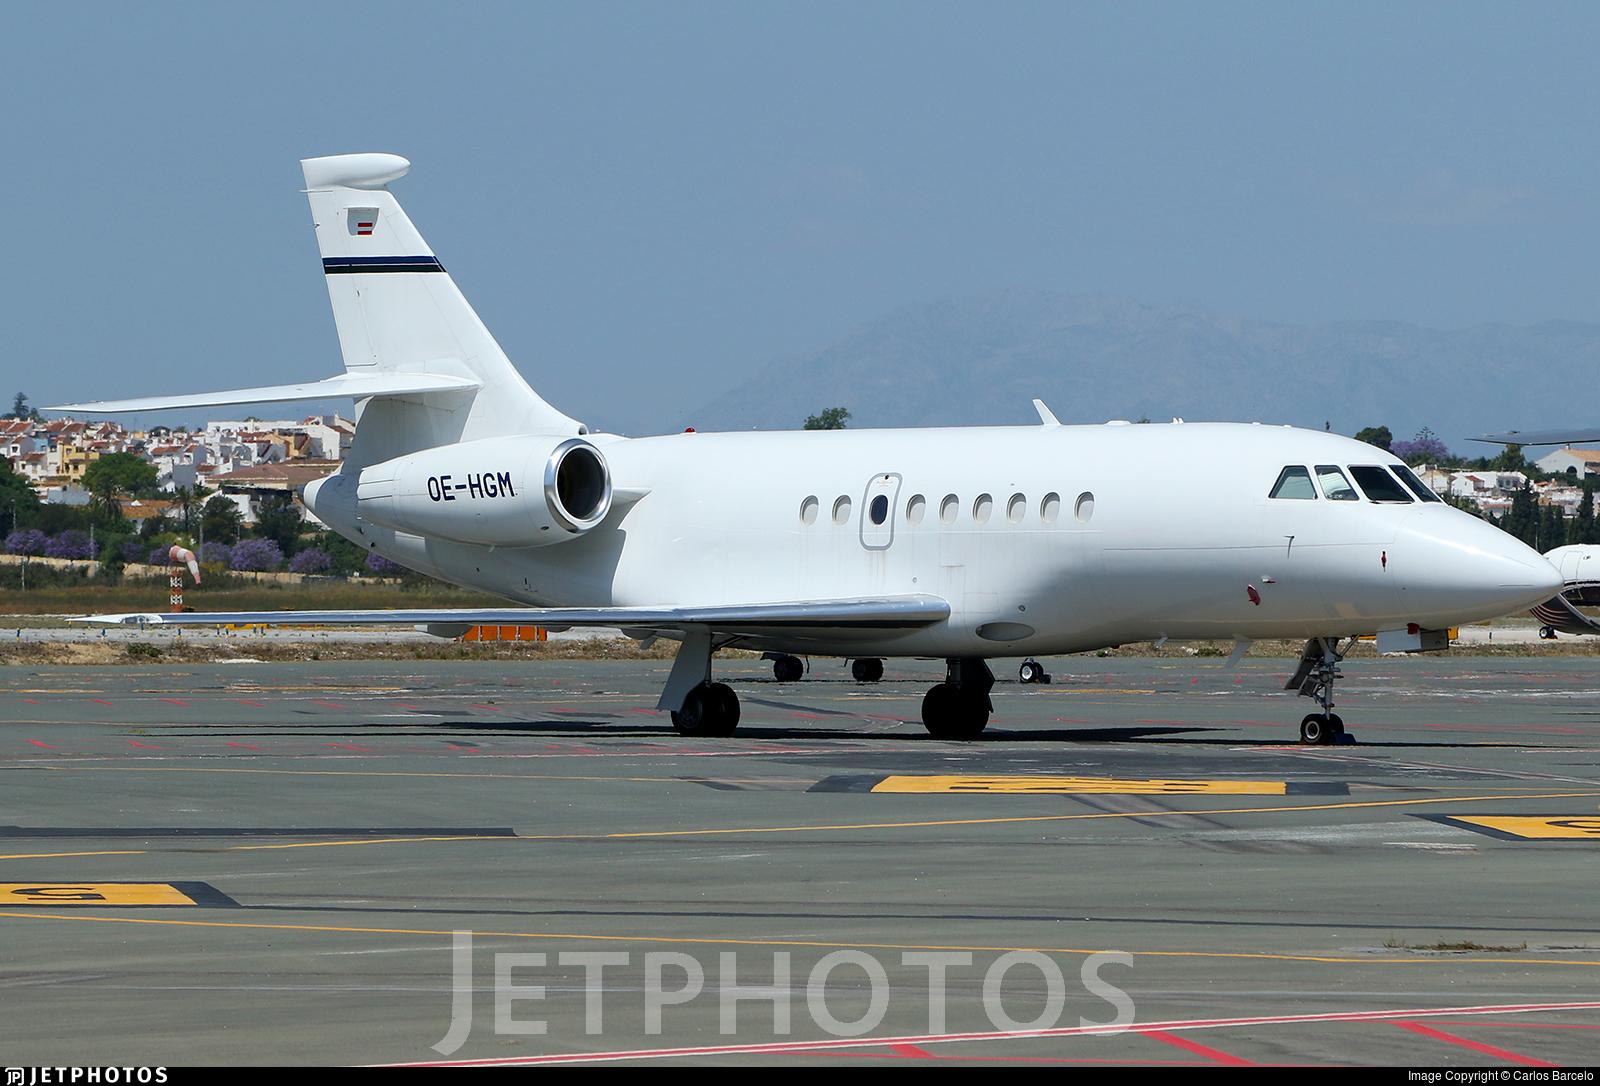 OE-HGM - Dassault Falcon 2000EX - Europ Star Aircraft